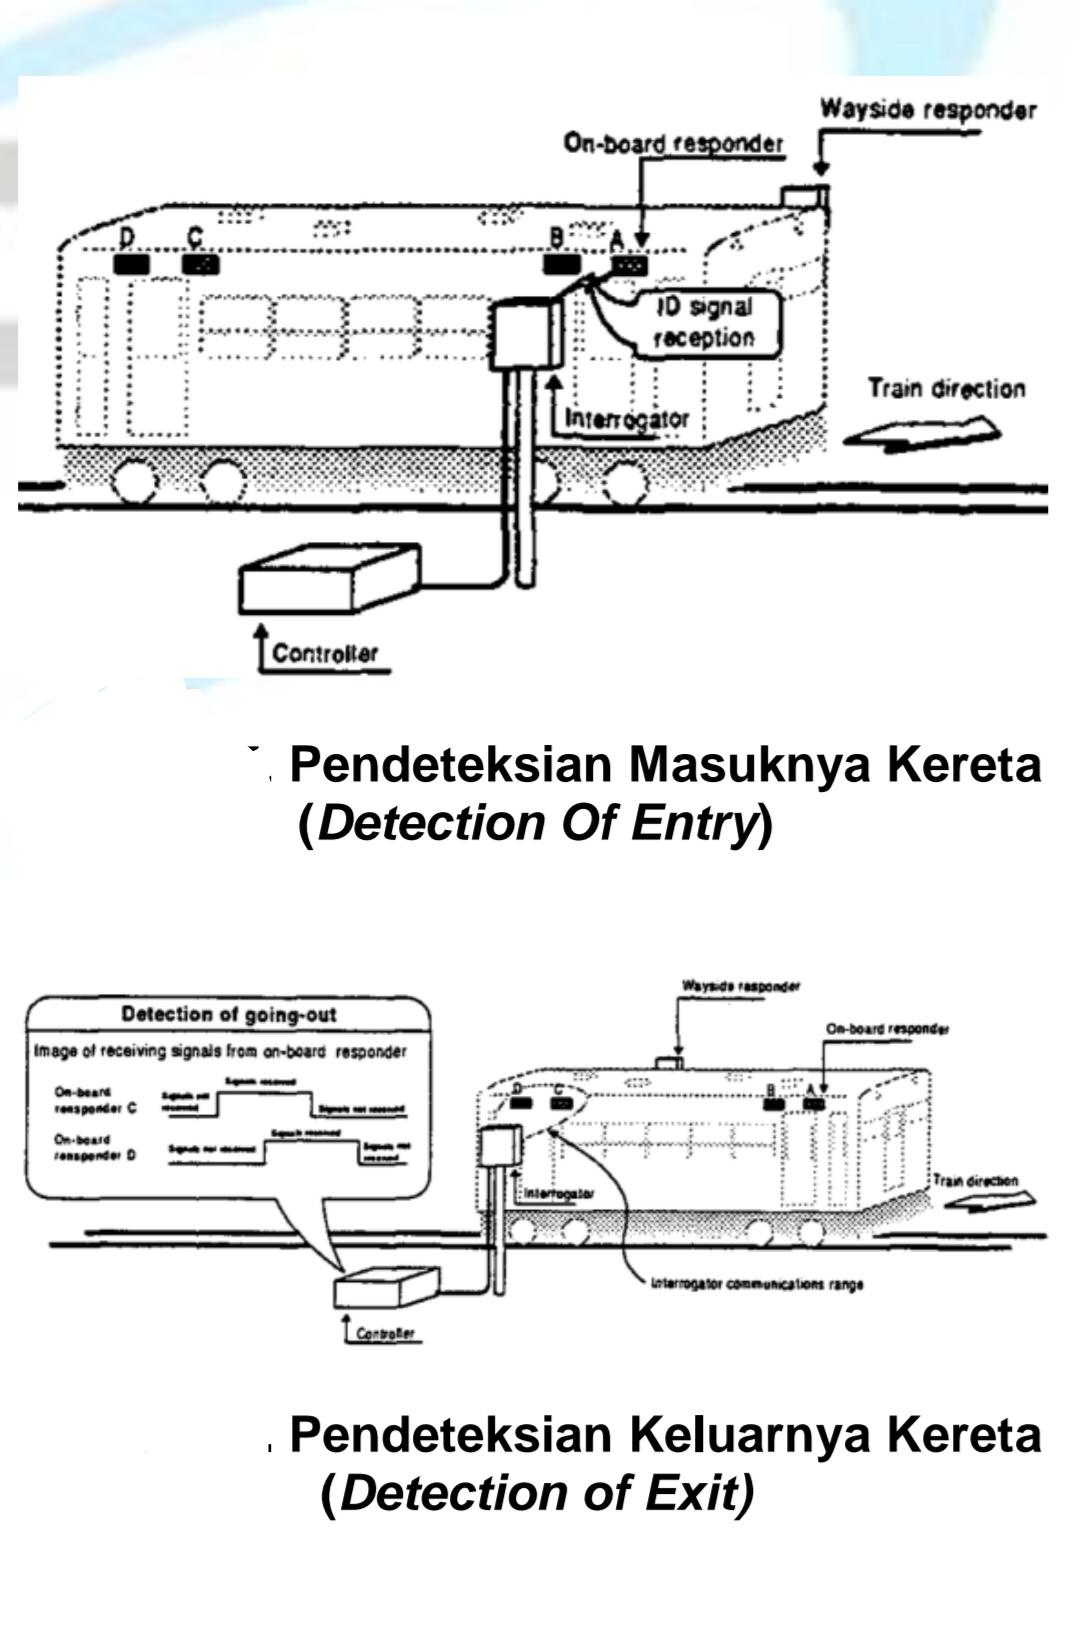 Deteksi Masuk dan Keluar Suatu Kereta Pada Sistem Gelombang Mikro Balise   Foto : BPPT